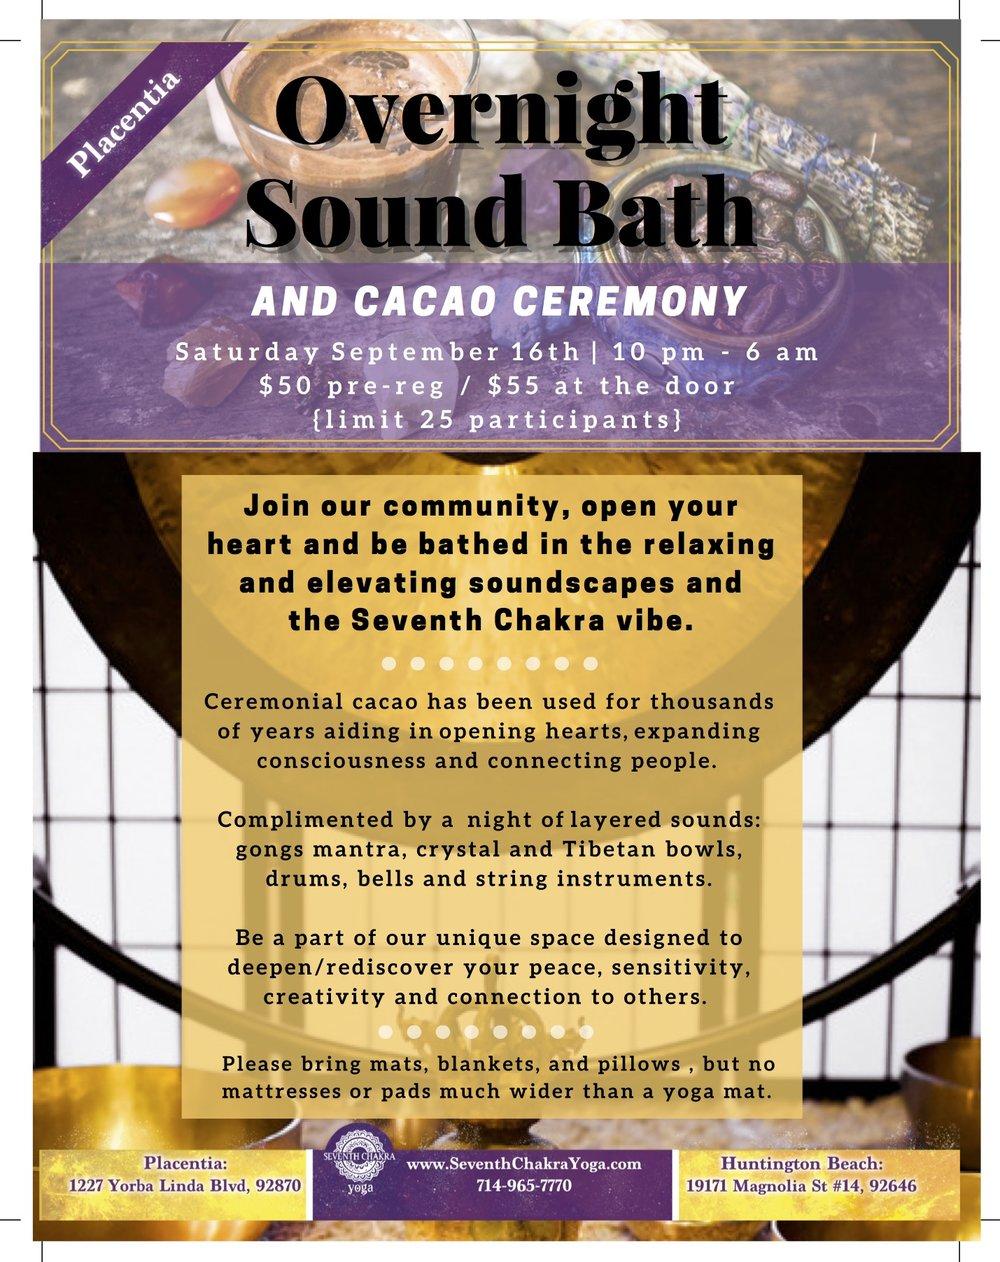 2017-09-16 Overnight Sound Bath.jpg